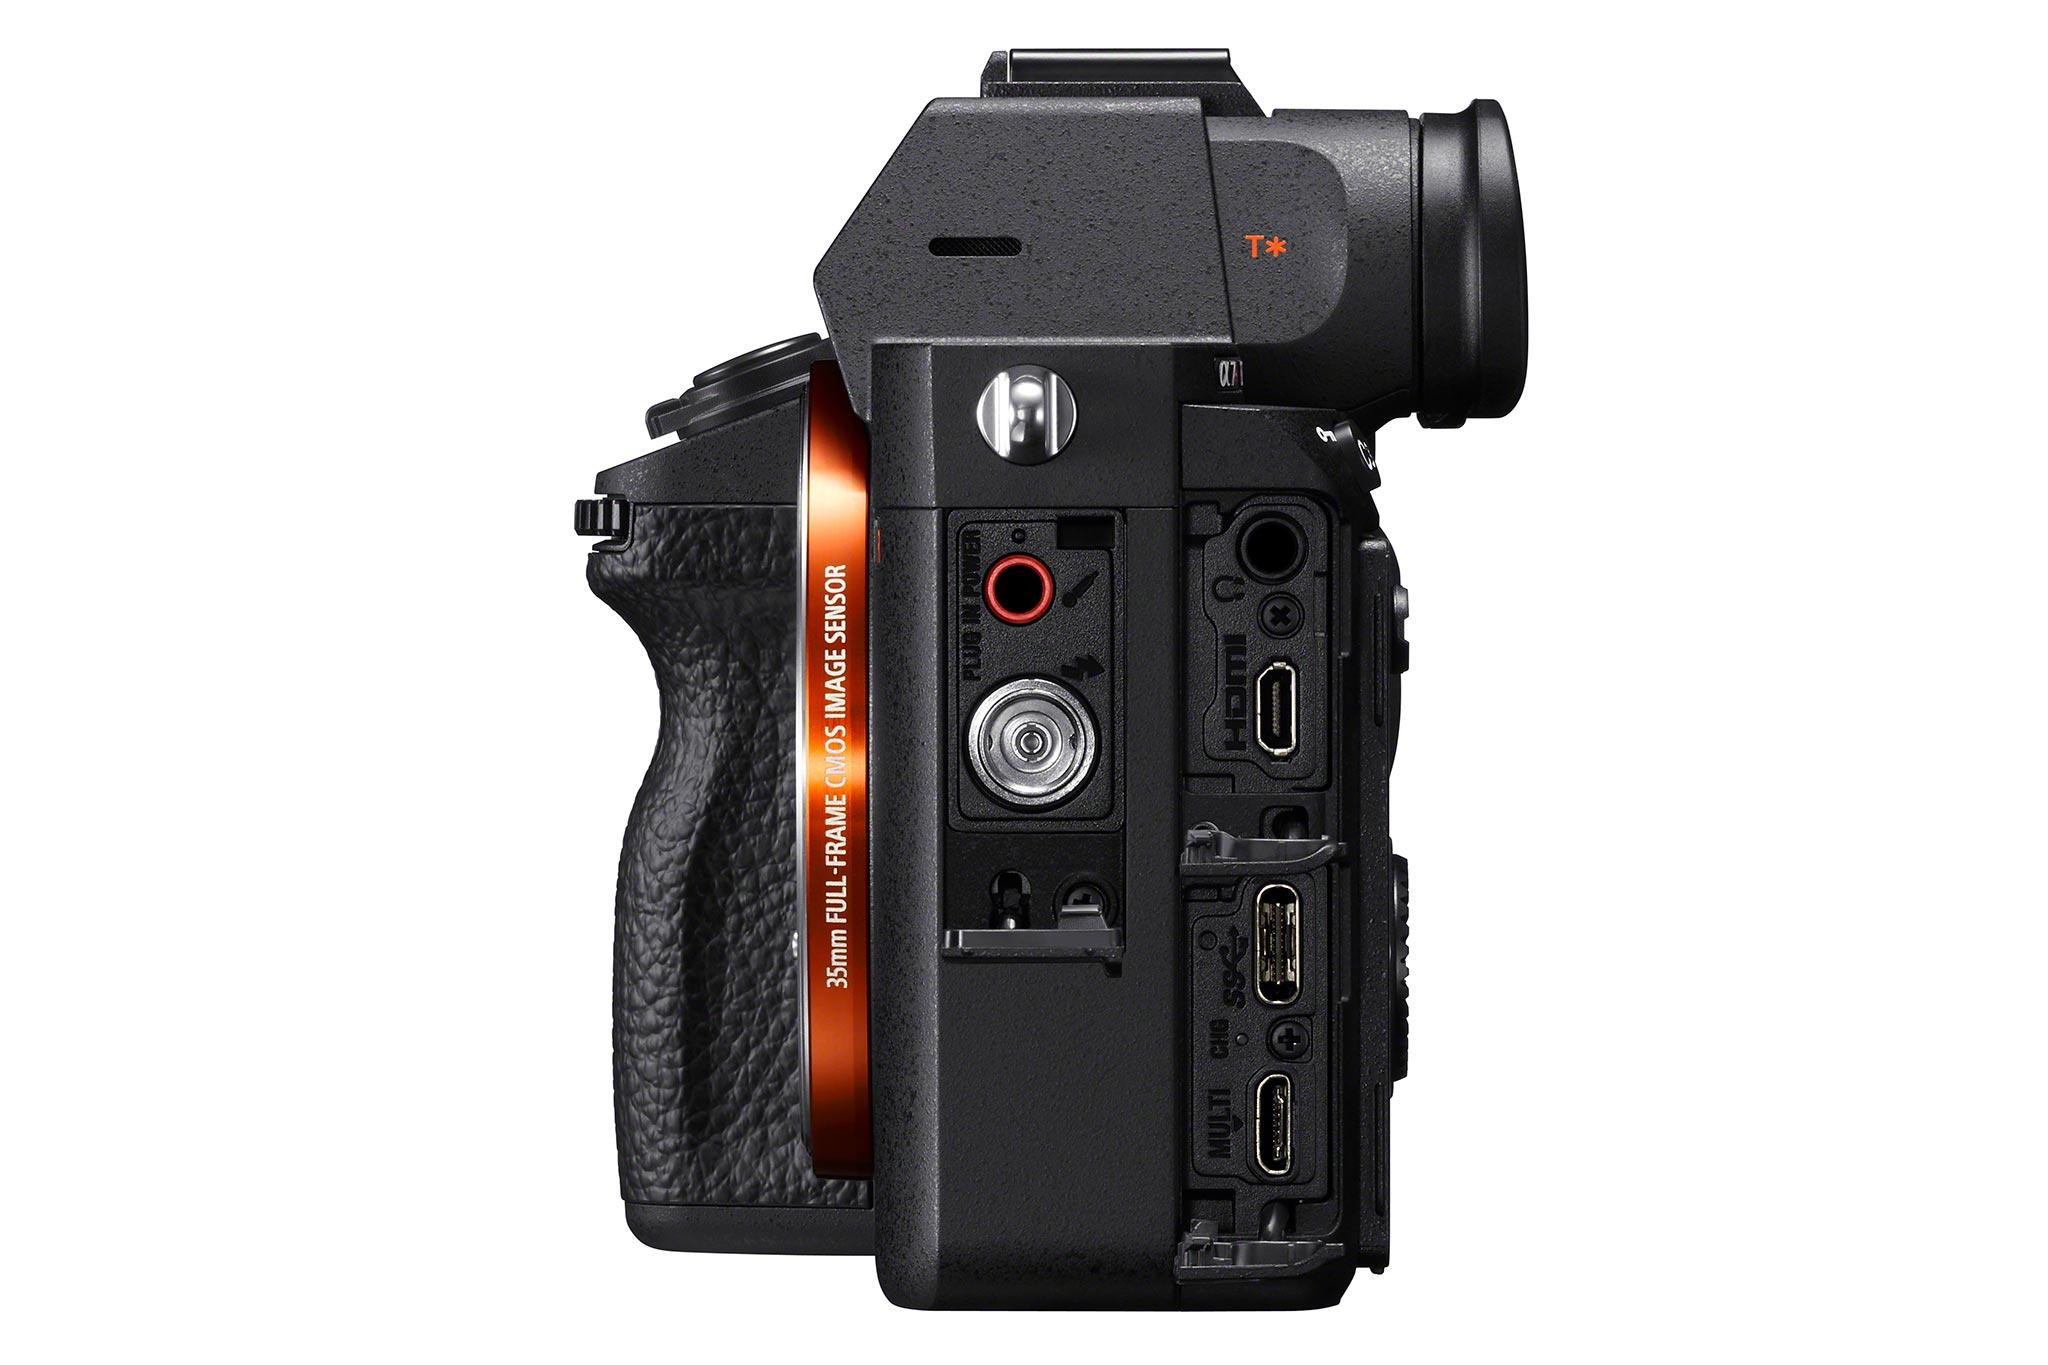 Sony A7 III chính thức: Exmor R 24 2 MP, 693 điểm lấy nét